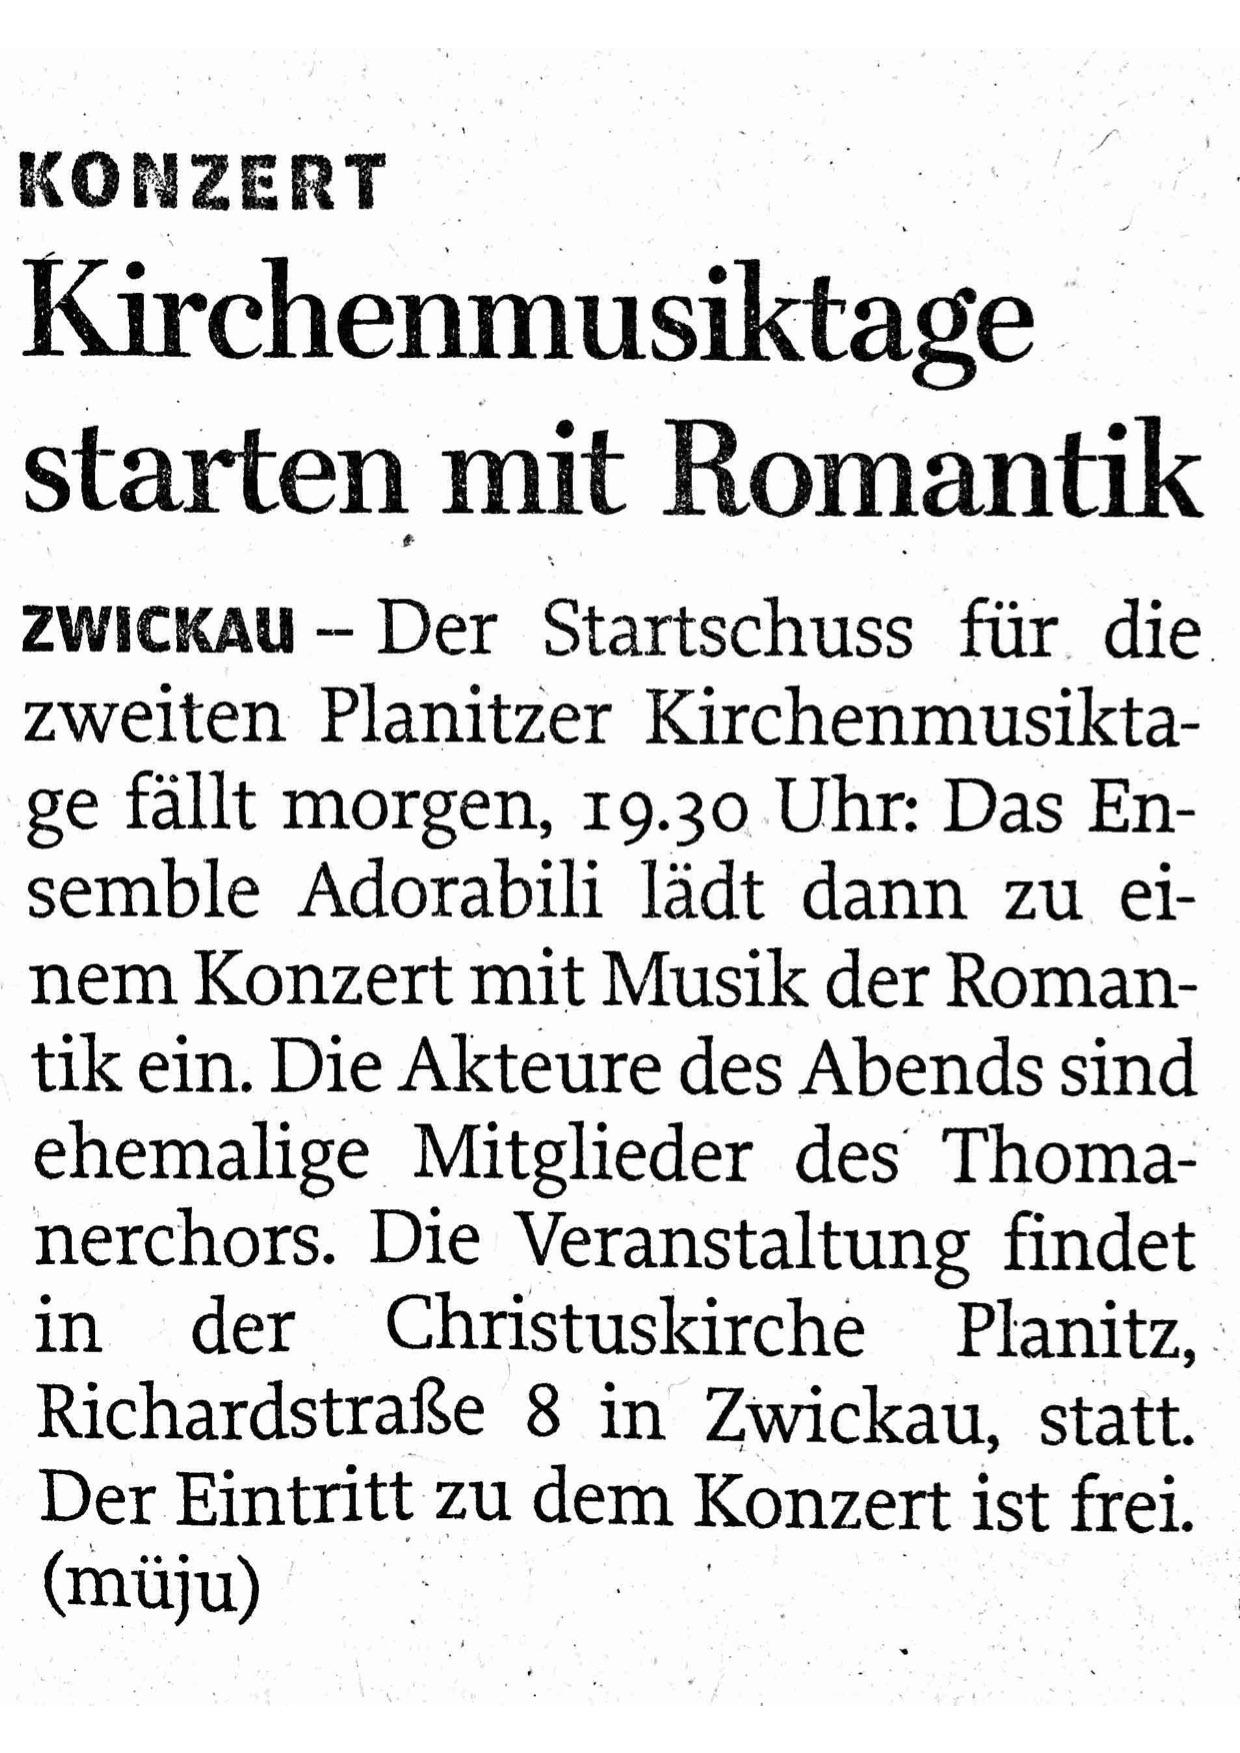 Freie Presse 23.03.17